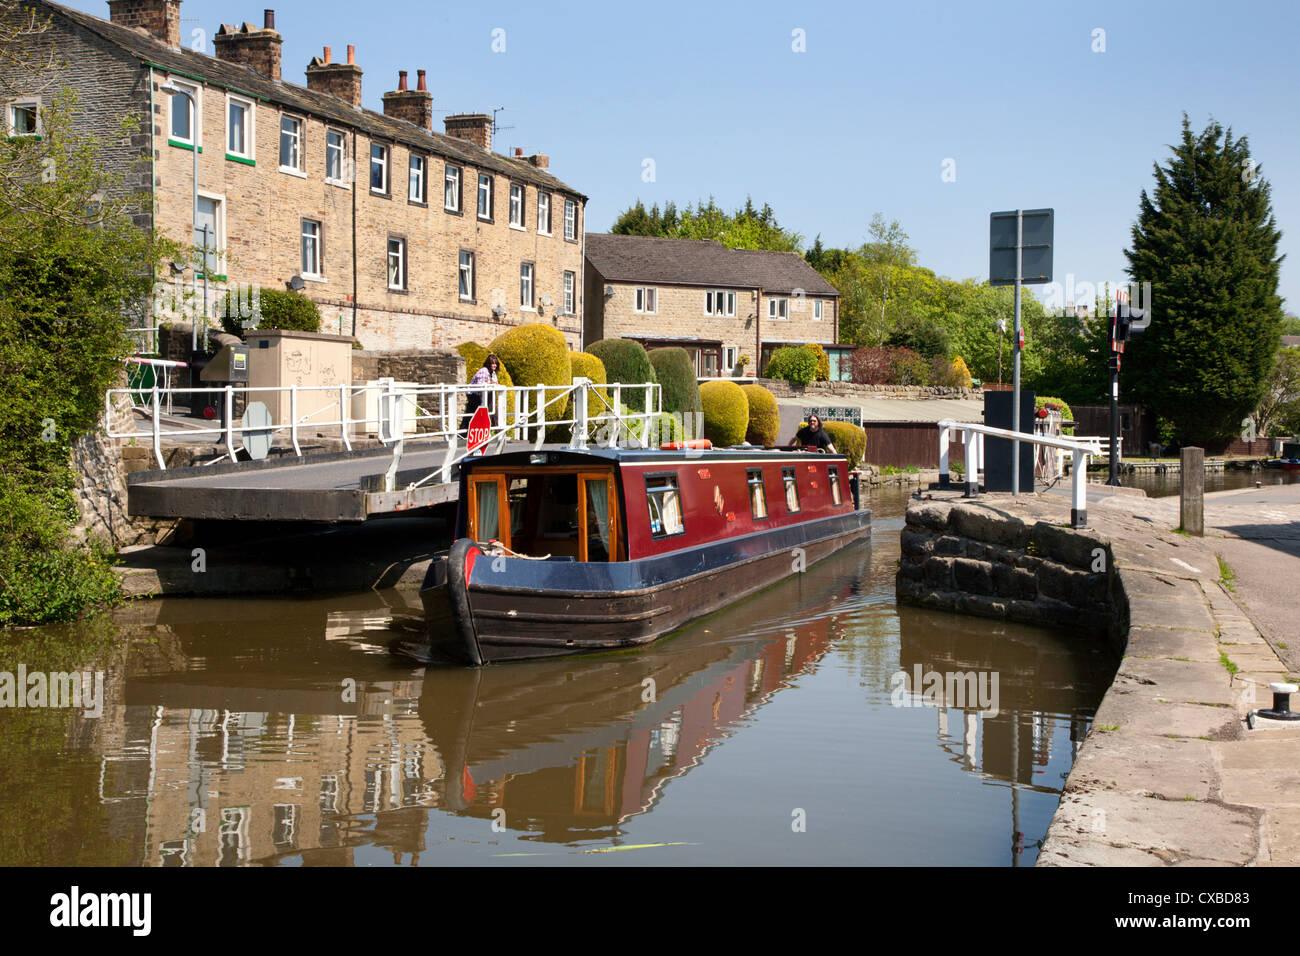 Narrowboat passing a Swing Bridge at Skipton, North Yorkshire, Yorkshire, England, United Kingdom, Europe - Stock Image